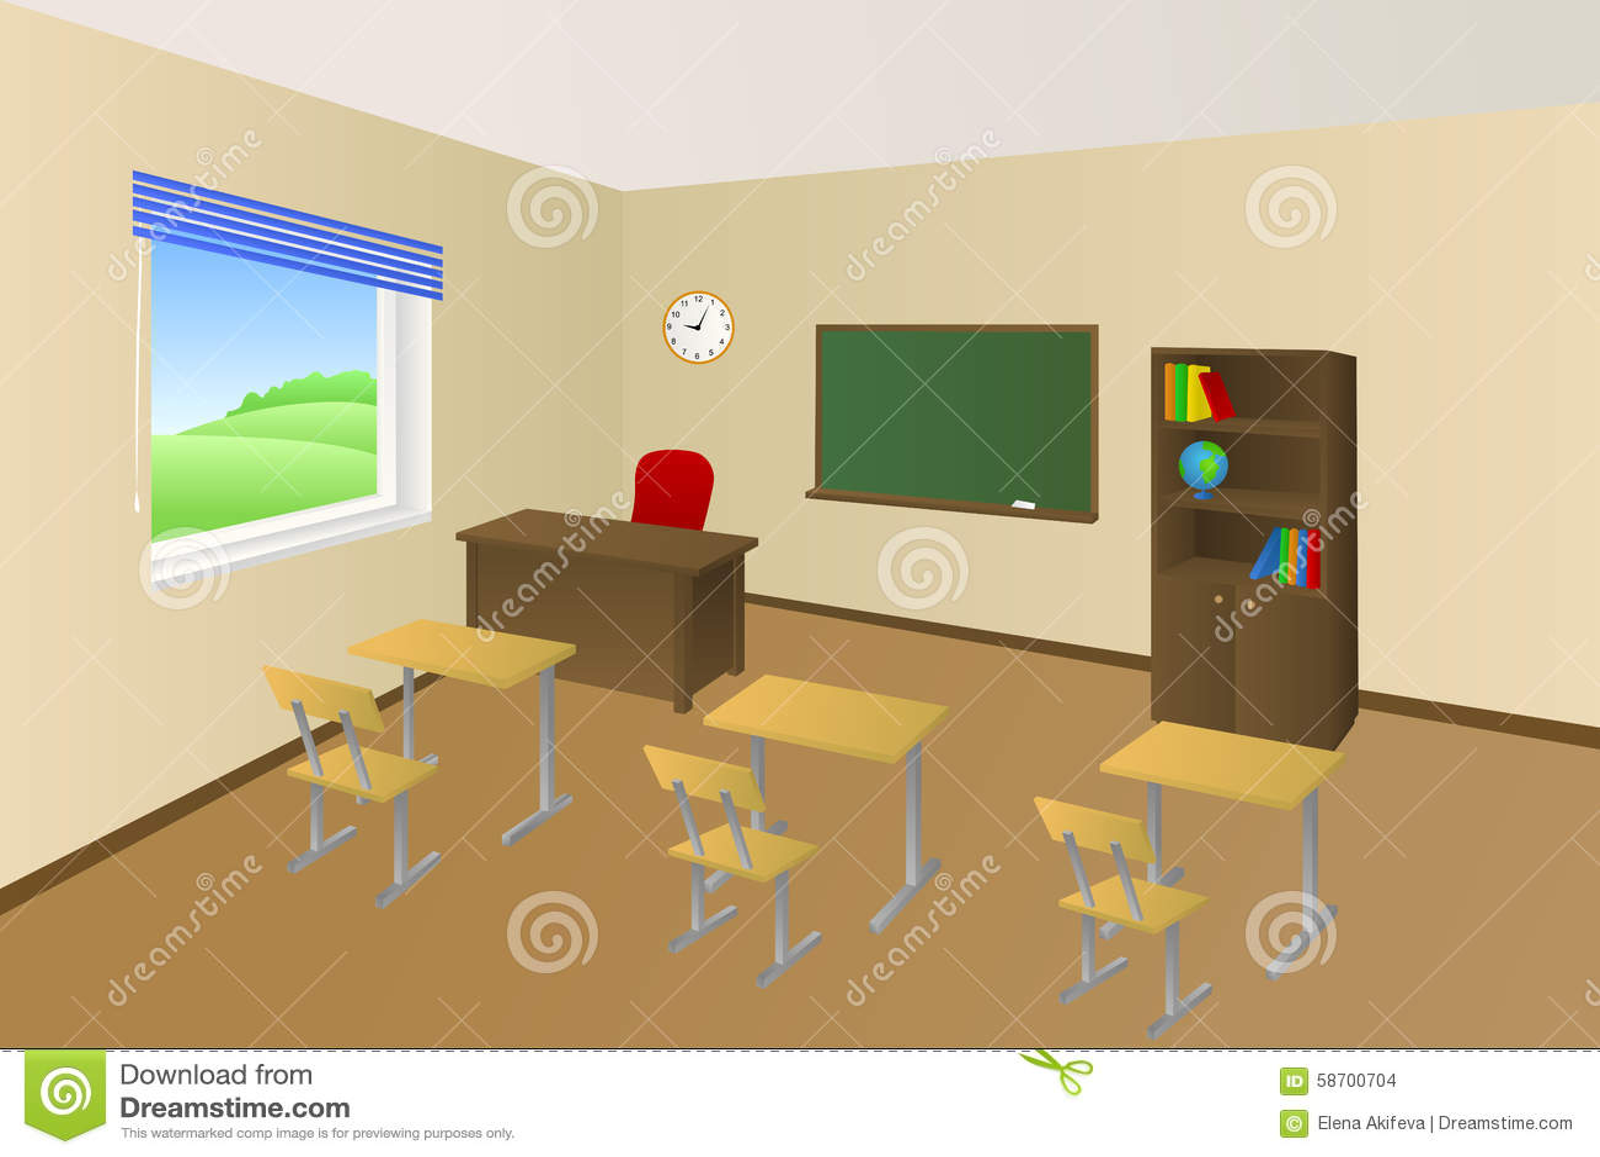 School Classroom Beige Education Table Chair Cabinet